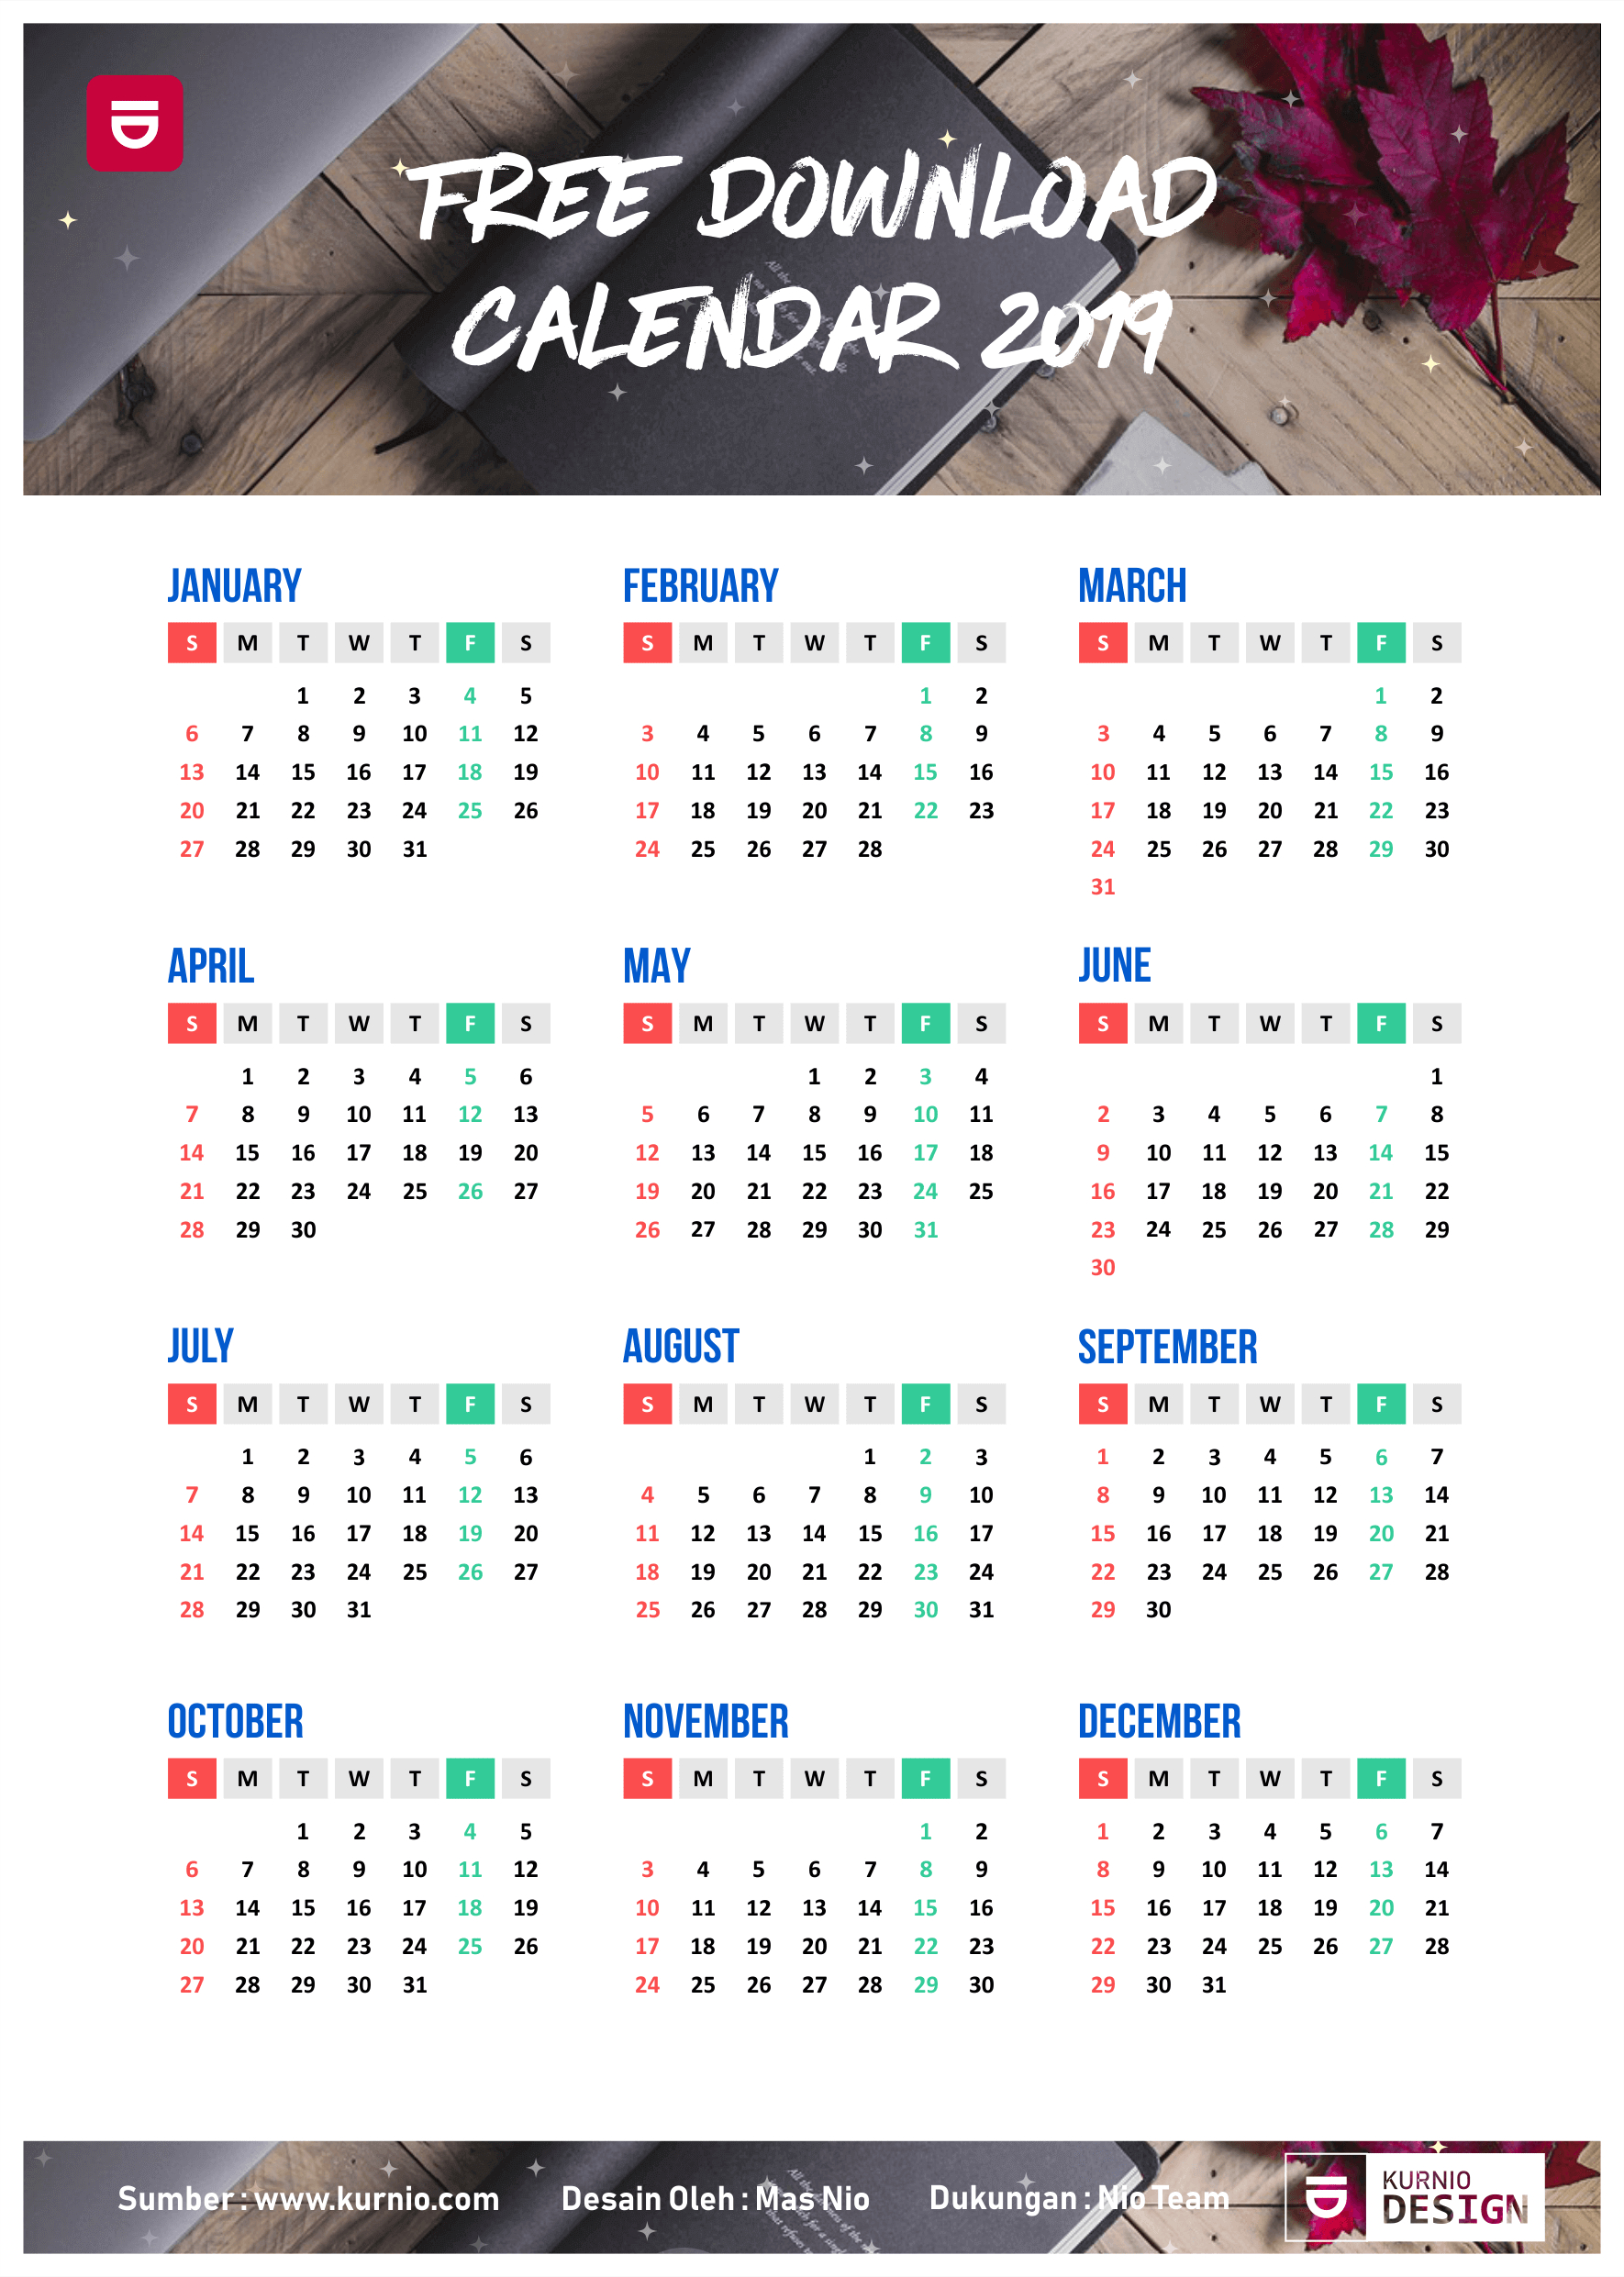 Download Template Calendar 2019 Vector Cdr Ai Psd | Download Calendar 2019 Template Psd